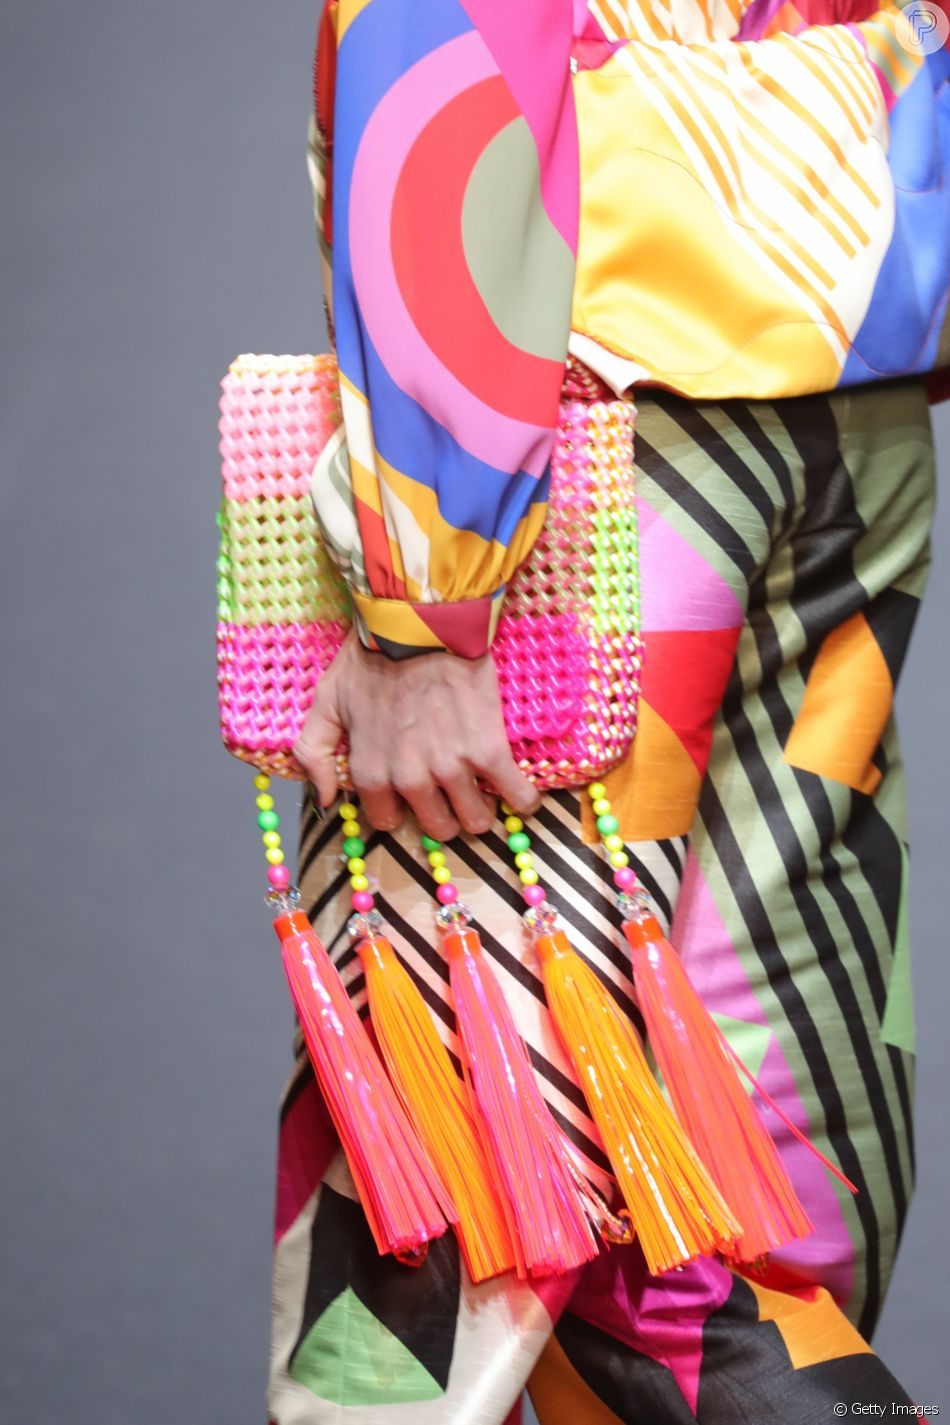 Bolsas de contas: colorida!